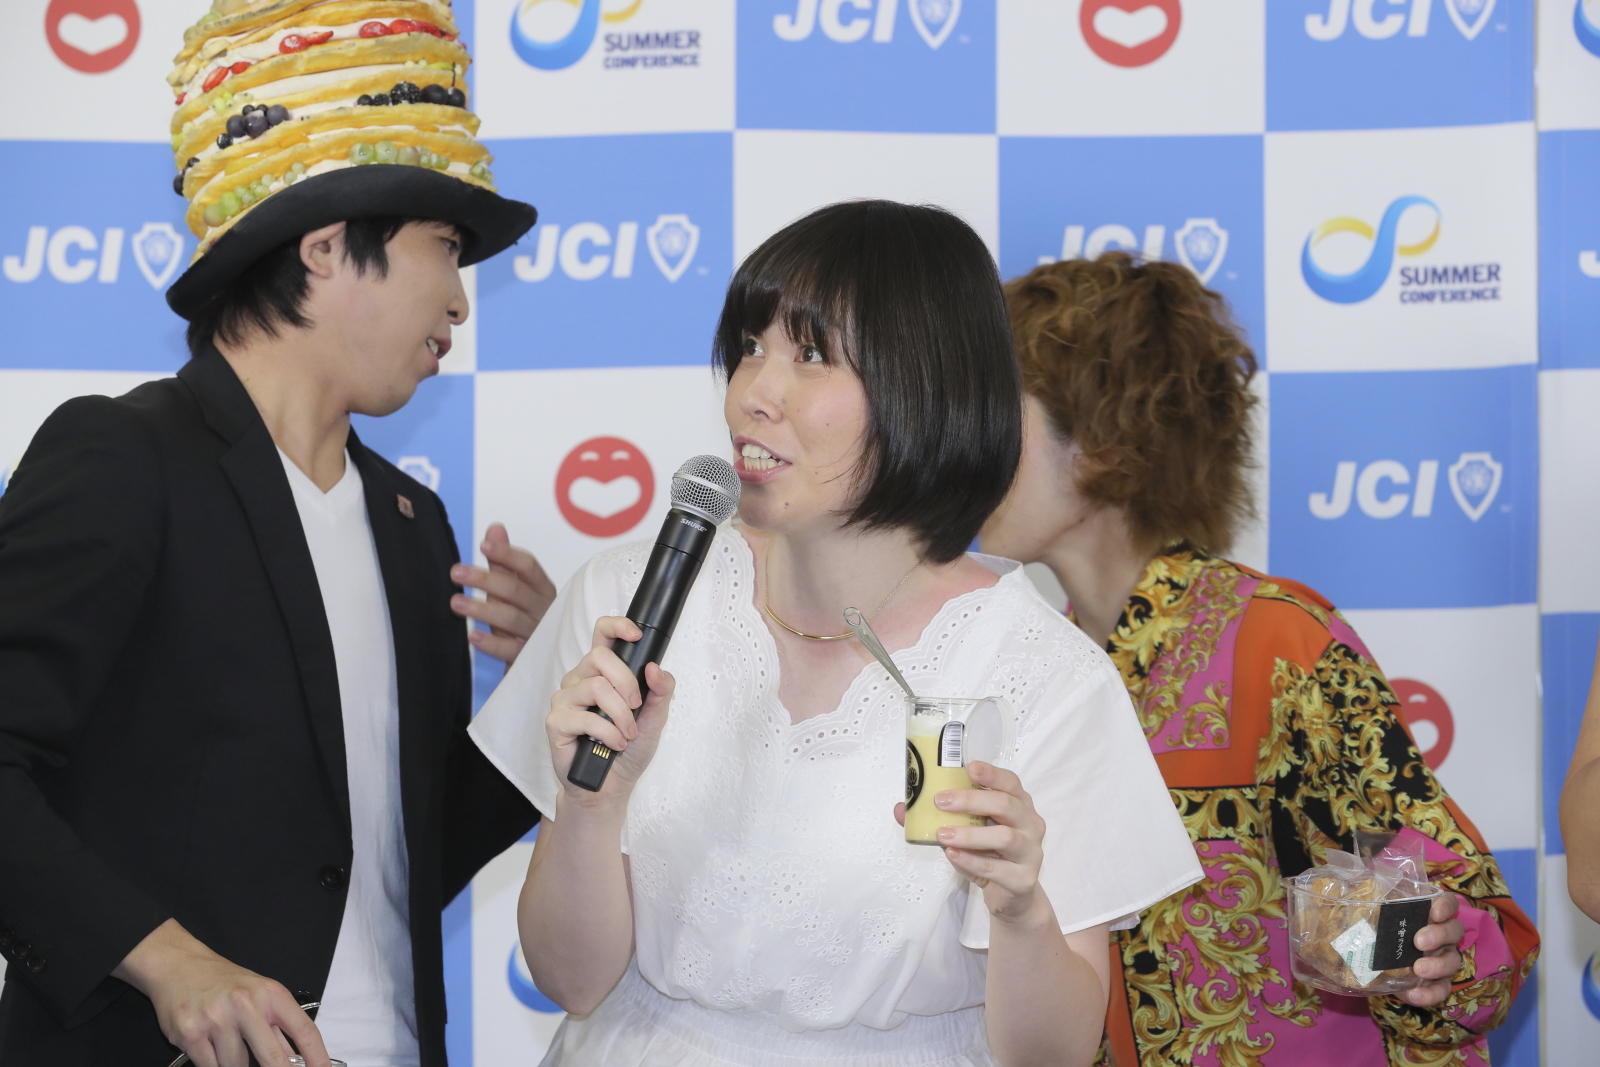 http://news.yoshimoto.co.jp/20170714133728-452248cd6b22cdb0321660ab8d94f635cd4b2b4e.jpg